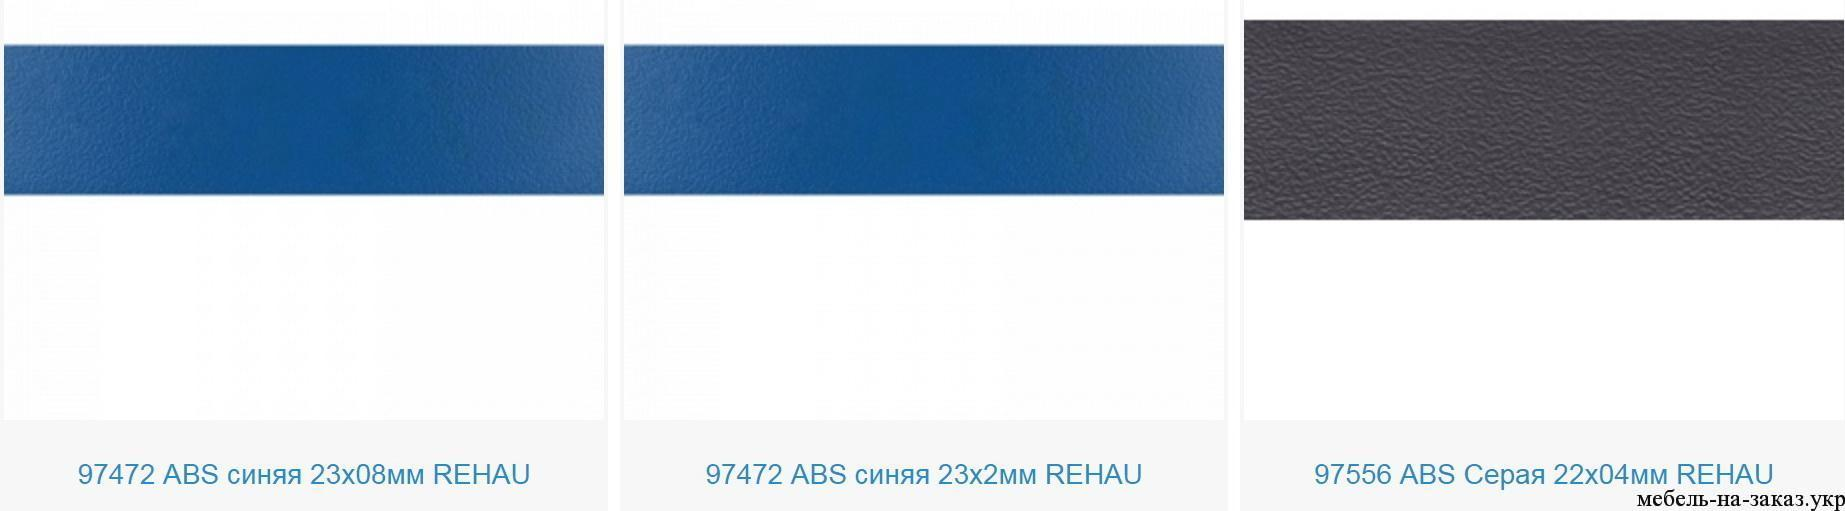 синяя кромка для мебели